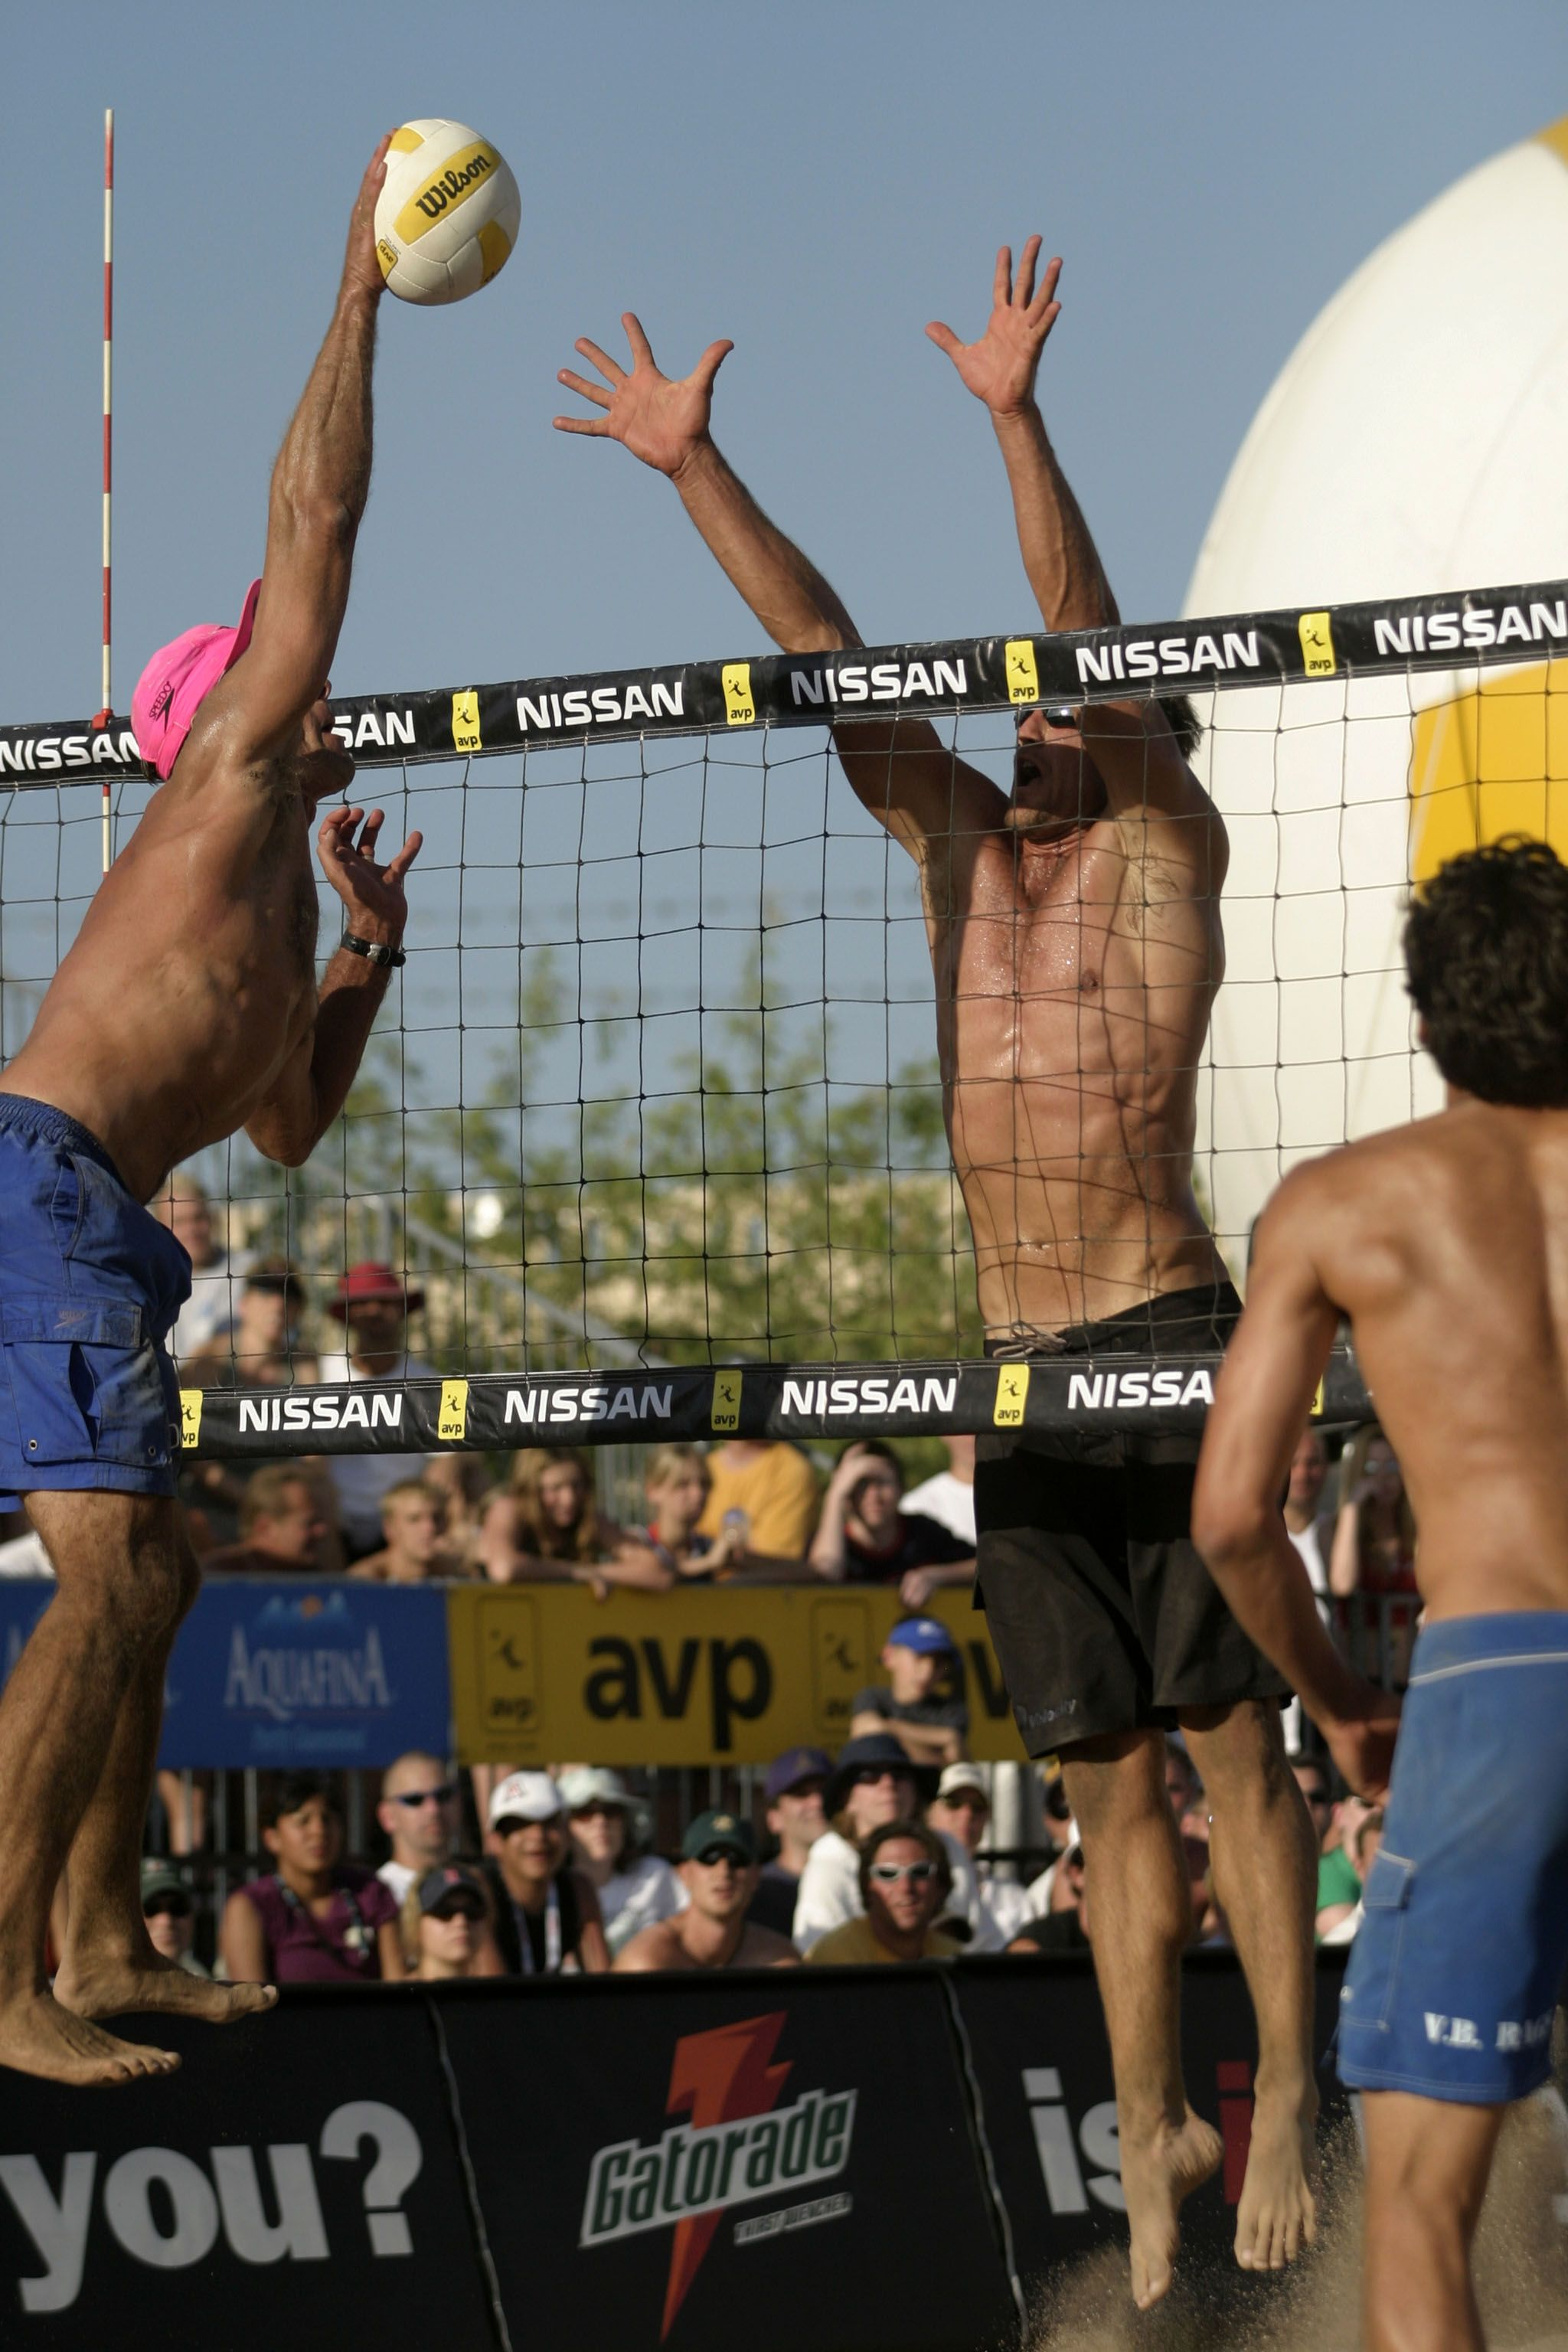 Pin By Volleyballdrills Tv On Volleyball Beach Volleyball Beach Volleyball Pictures Volleyball Pictures